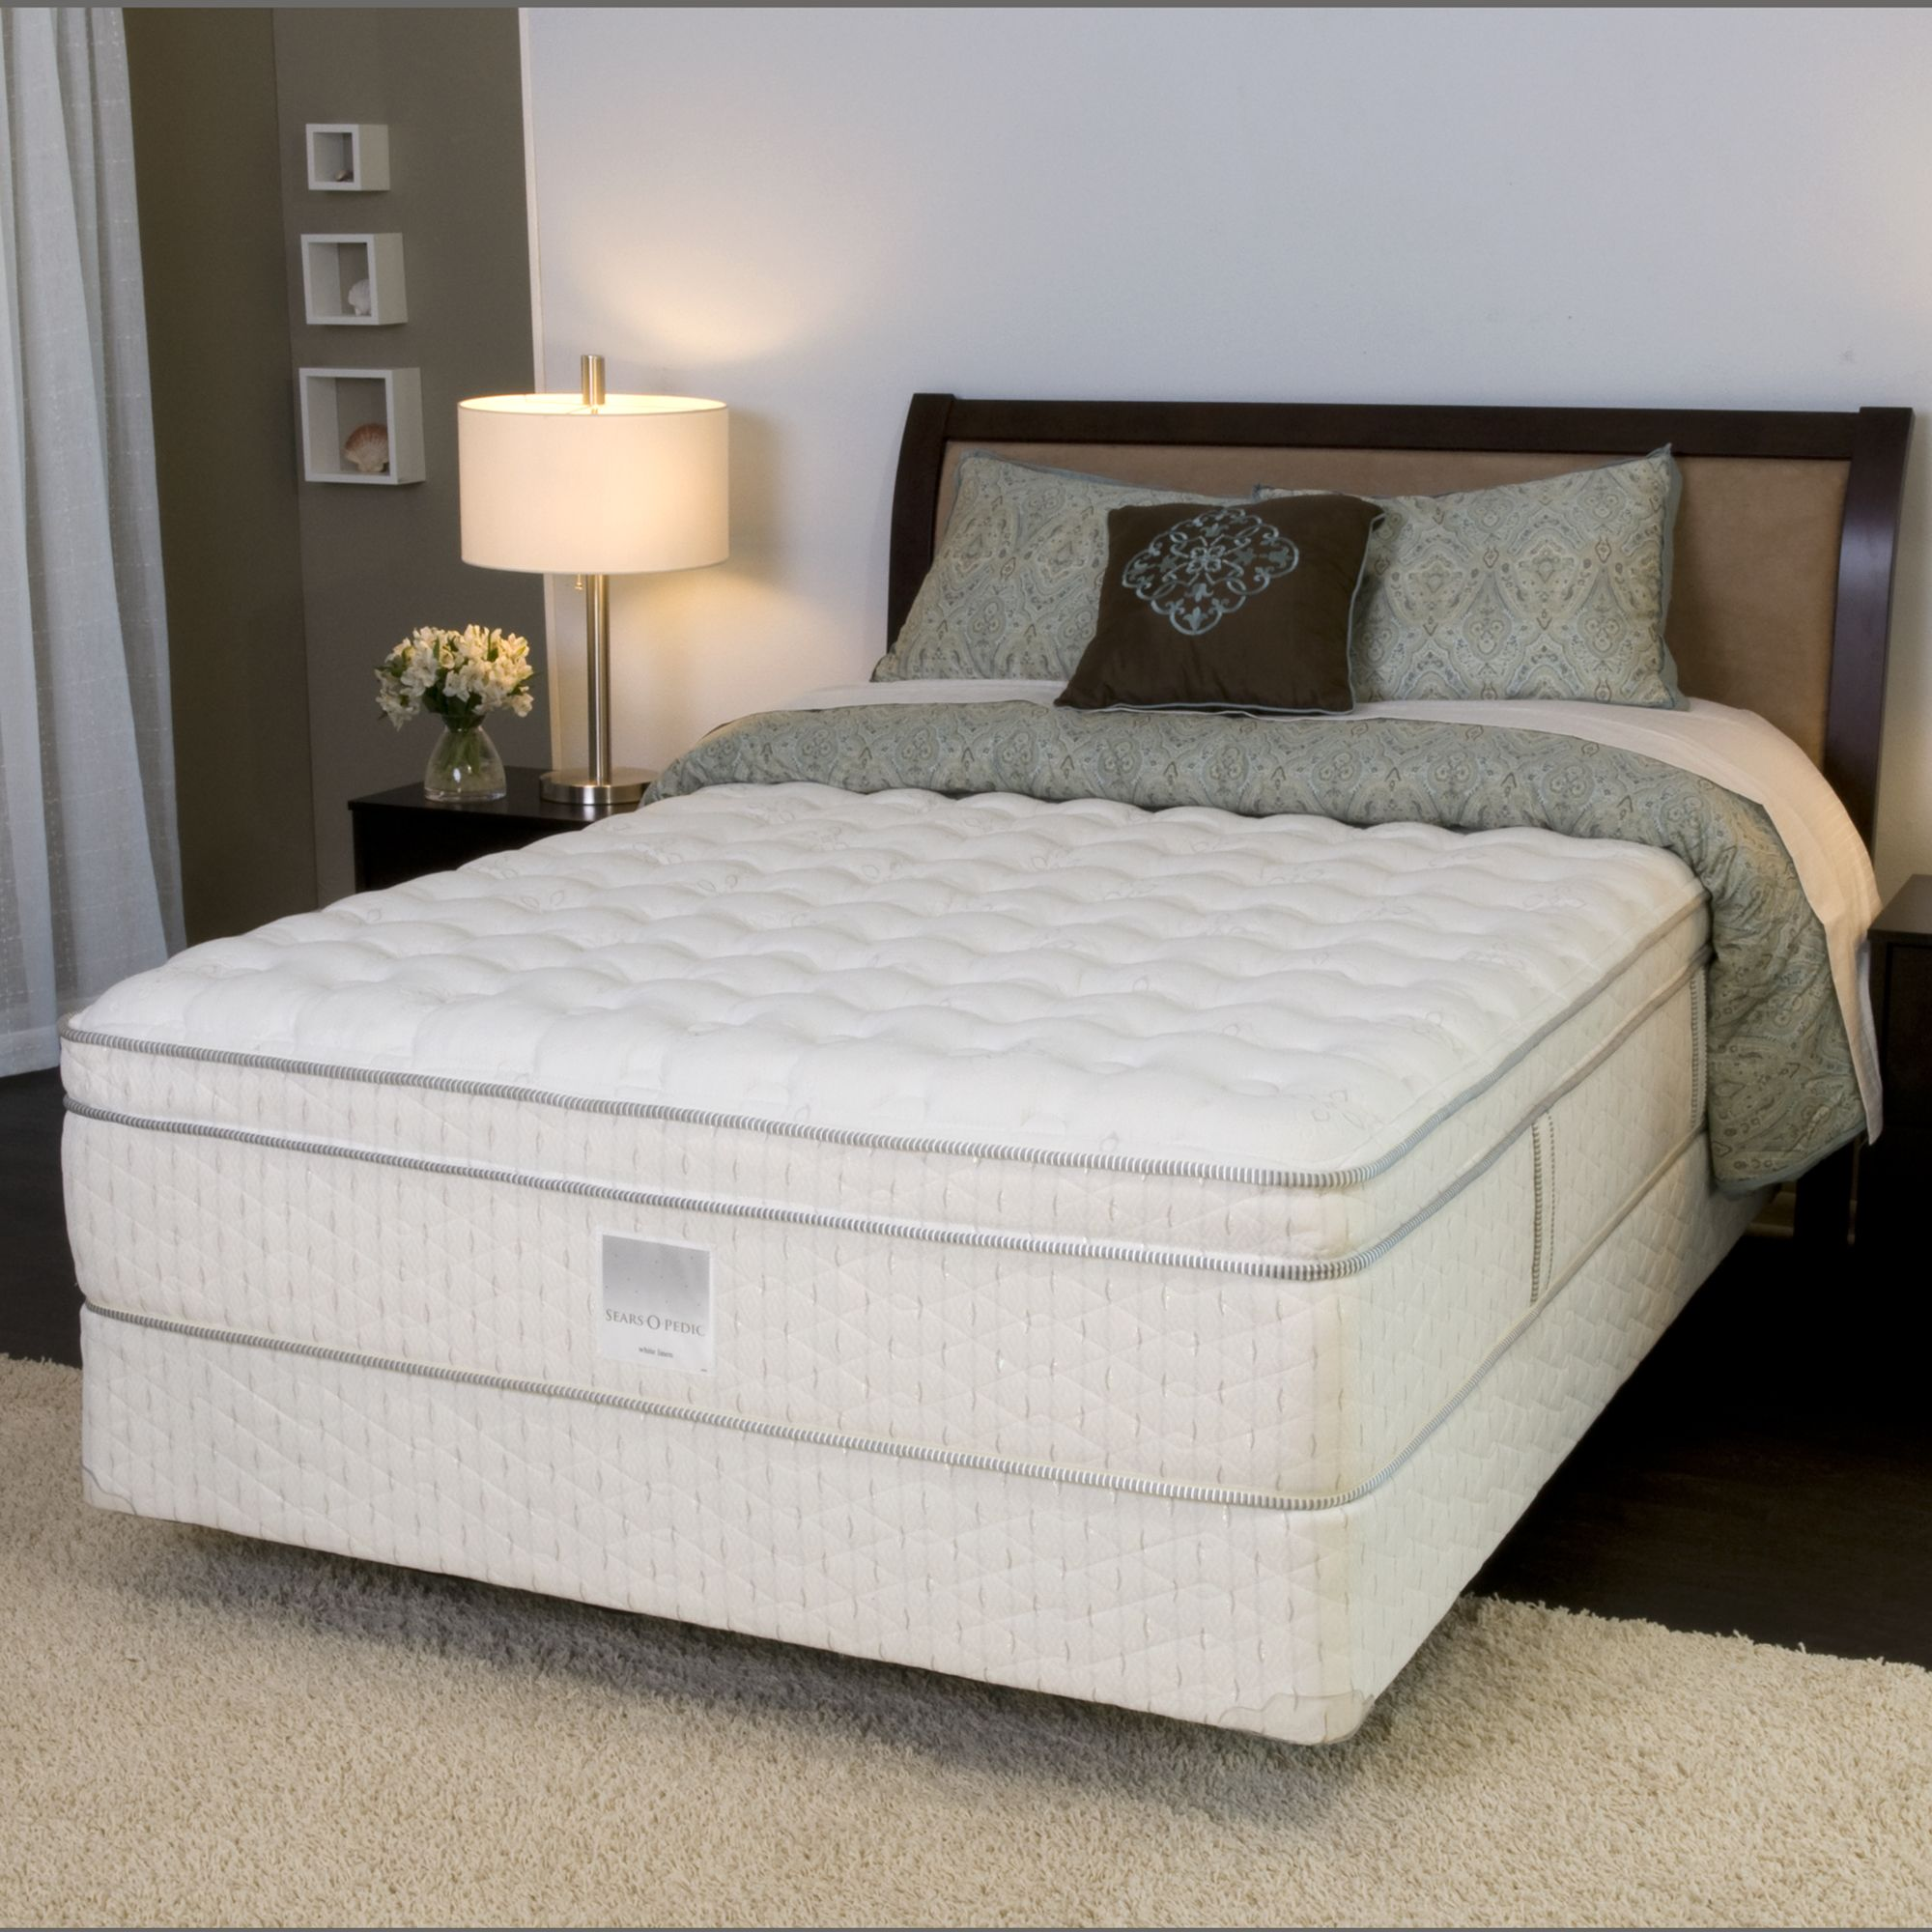 Sears O Pedic Queen Mattress Only White Linen II EuroTop Firm